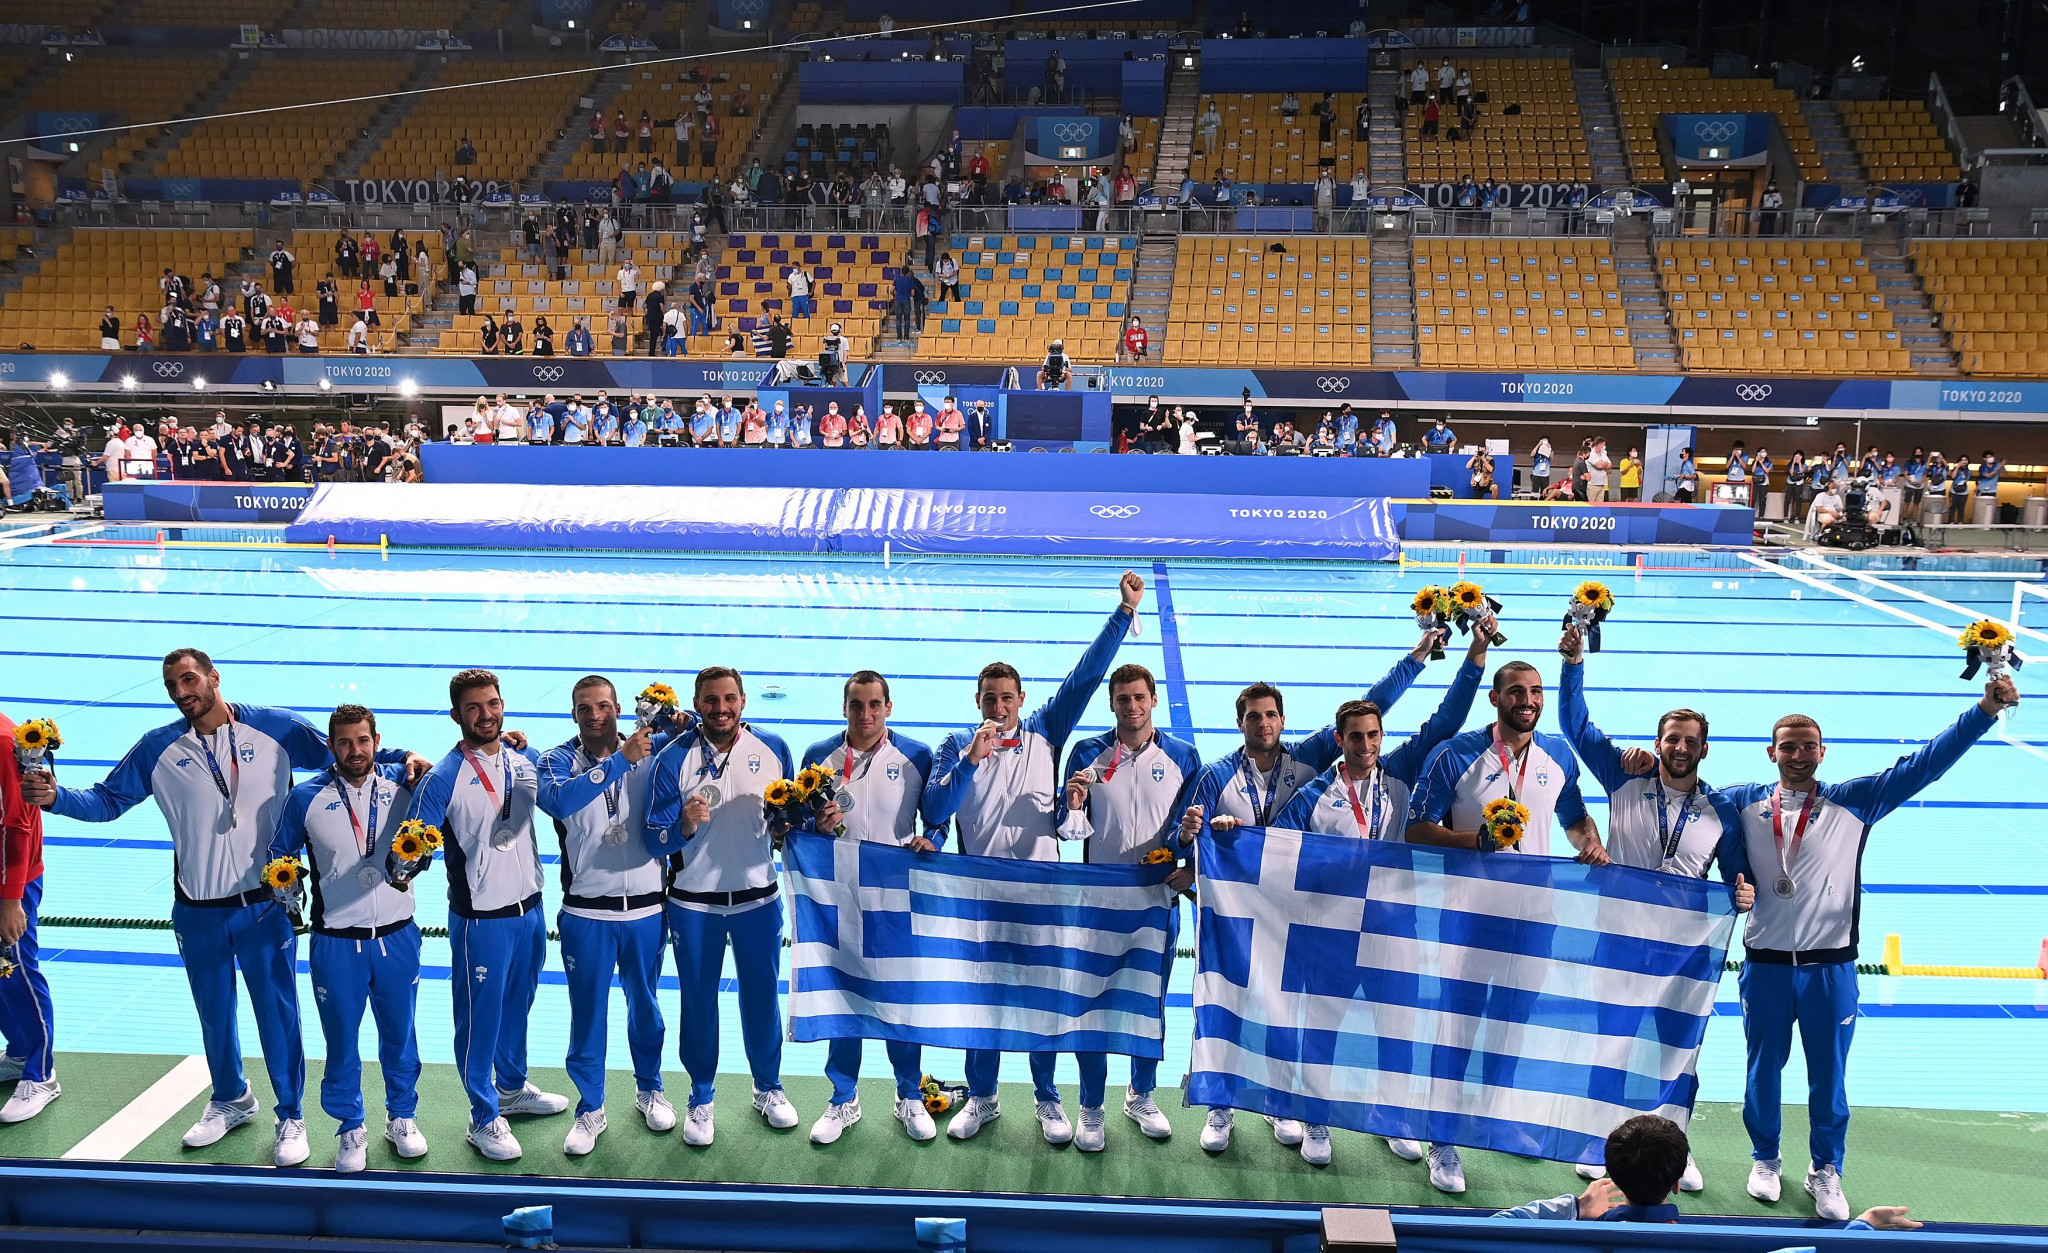 Greece seeking historic third straight FINA Men's Junior Water Polo World Championship crown